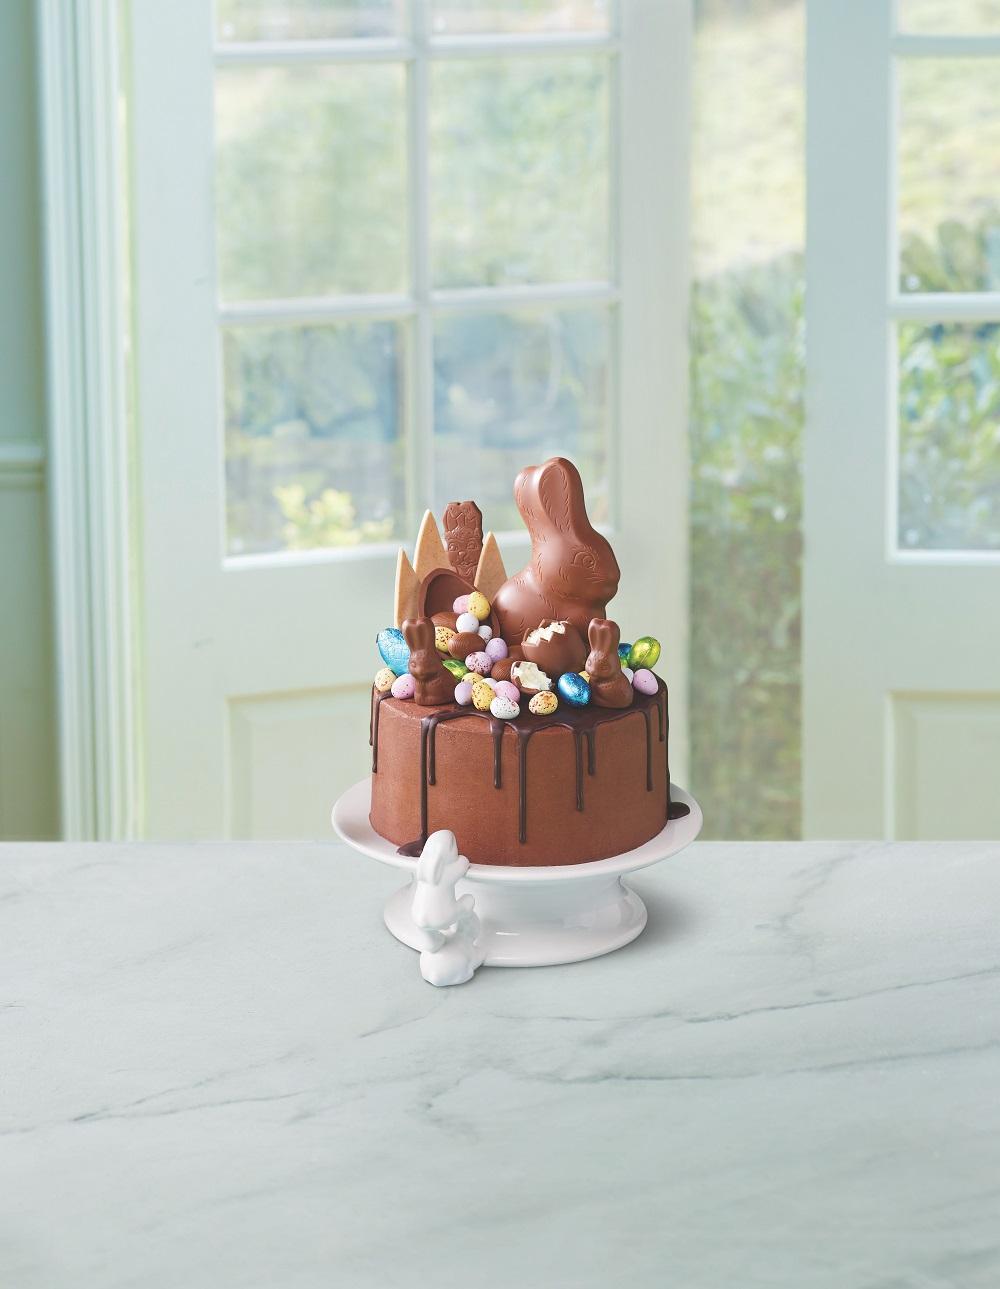 Aldi's Show-Stopper Easter Chocolate Cake Recipe: